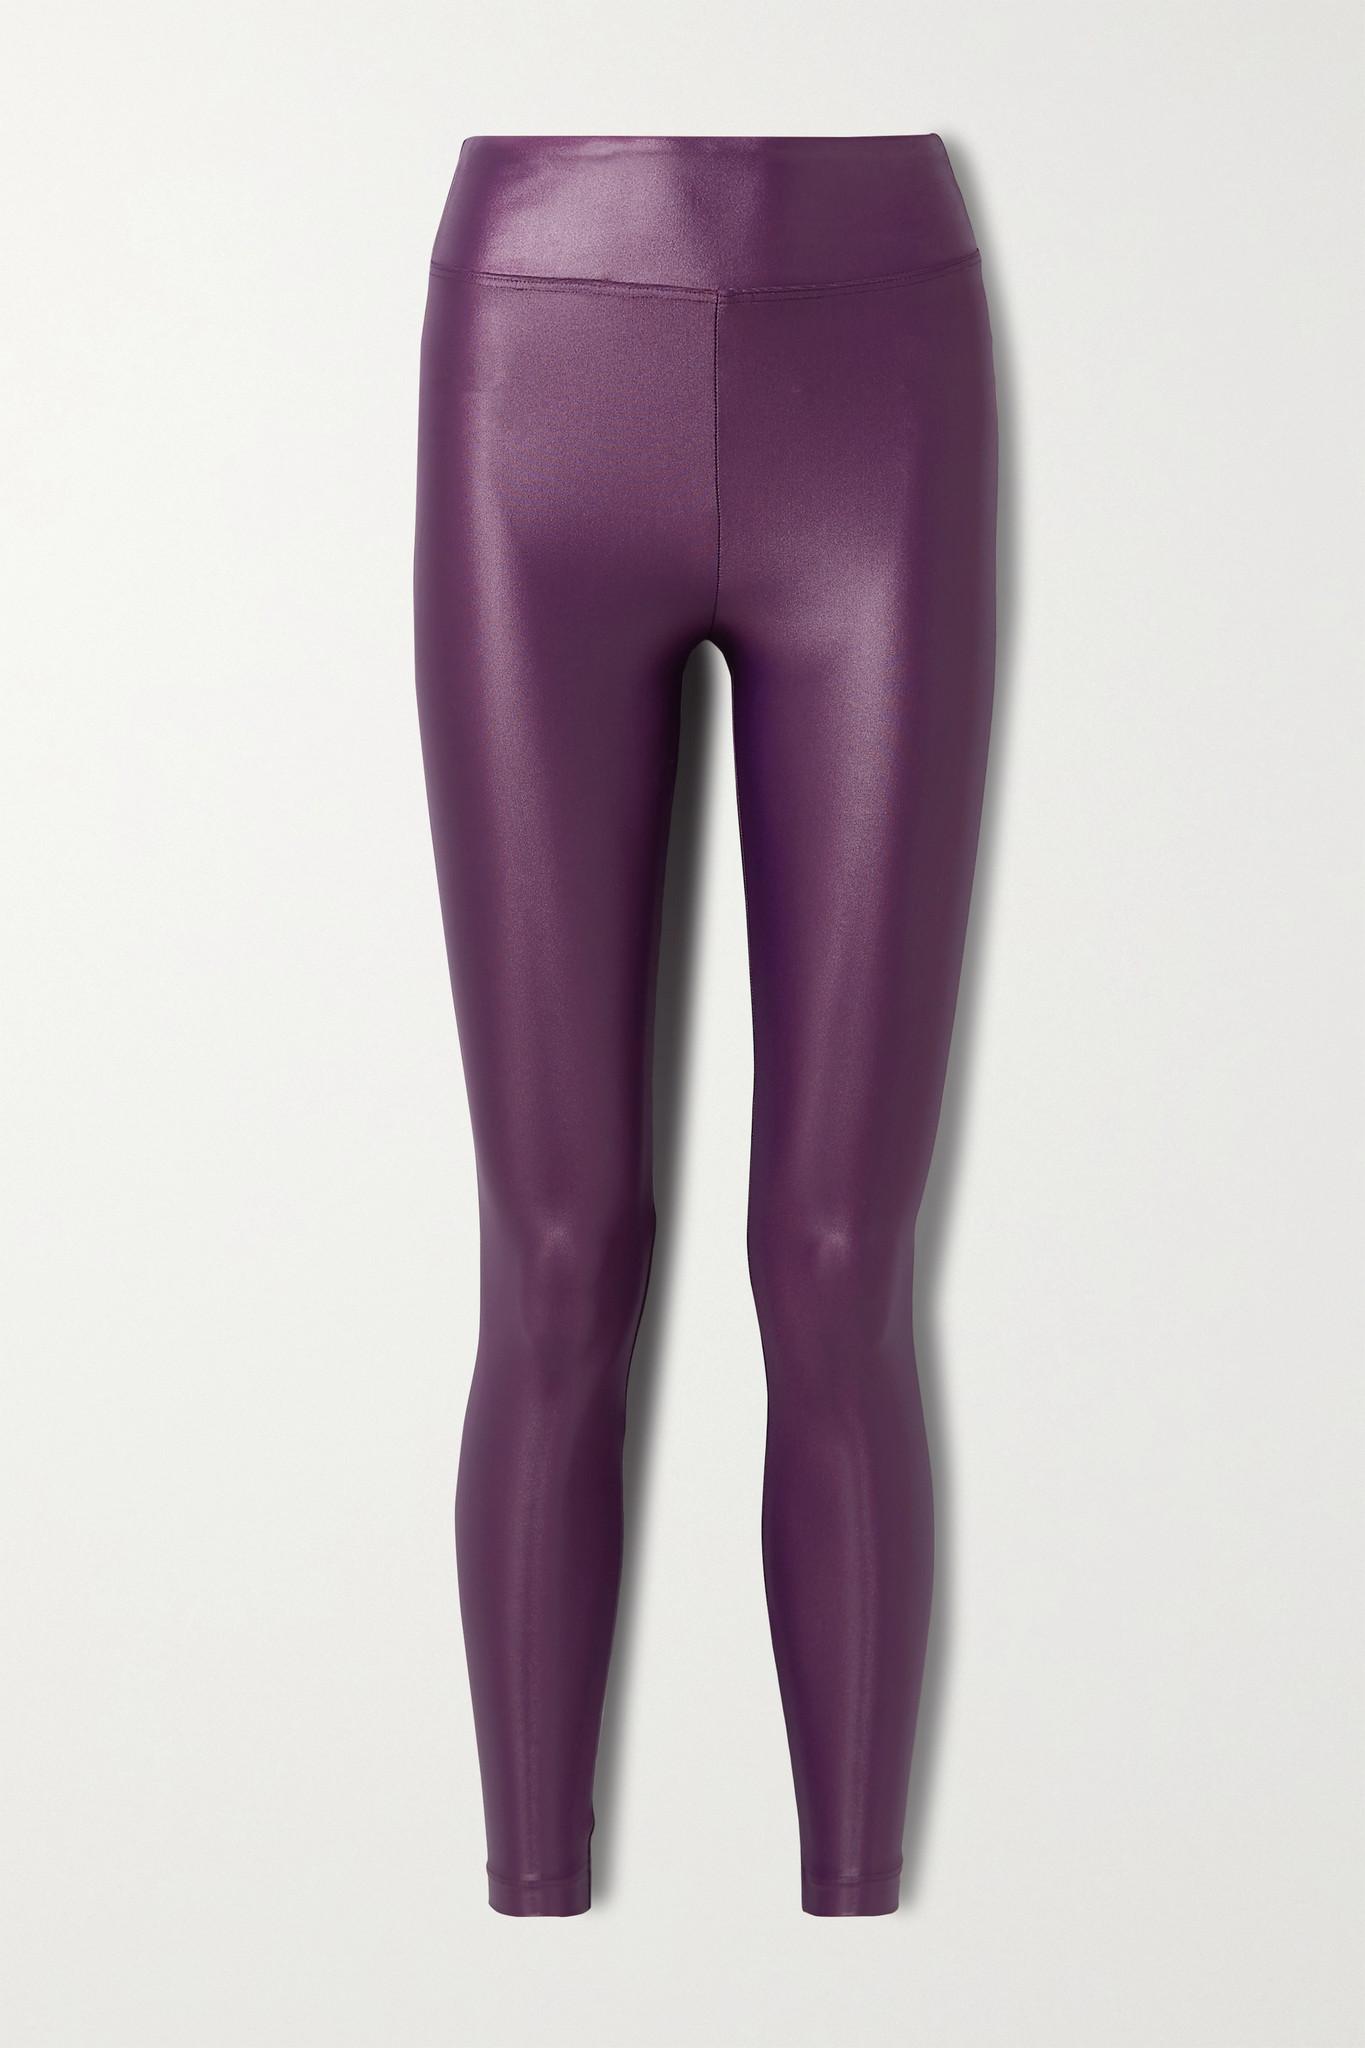 KORAL - Lustrous Stretch Leggings - Purple - large